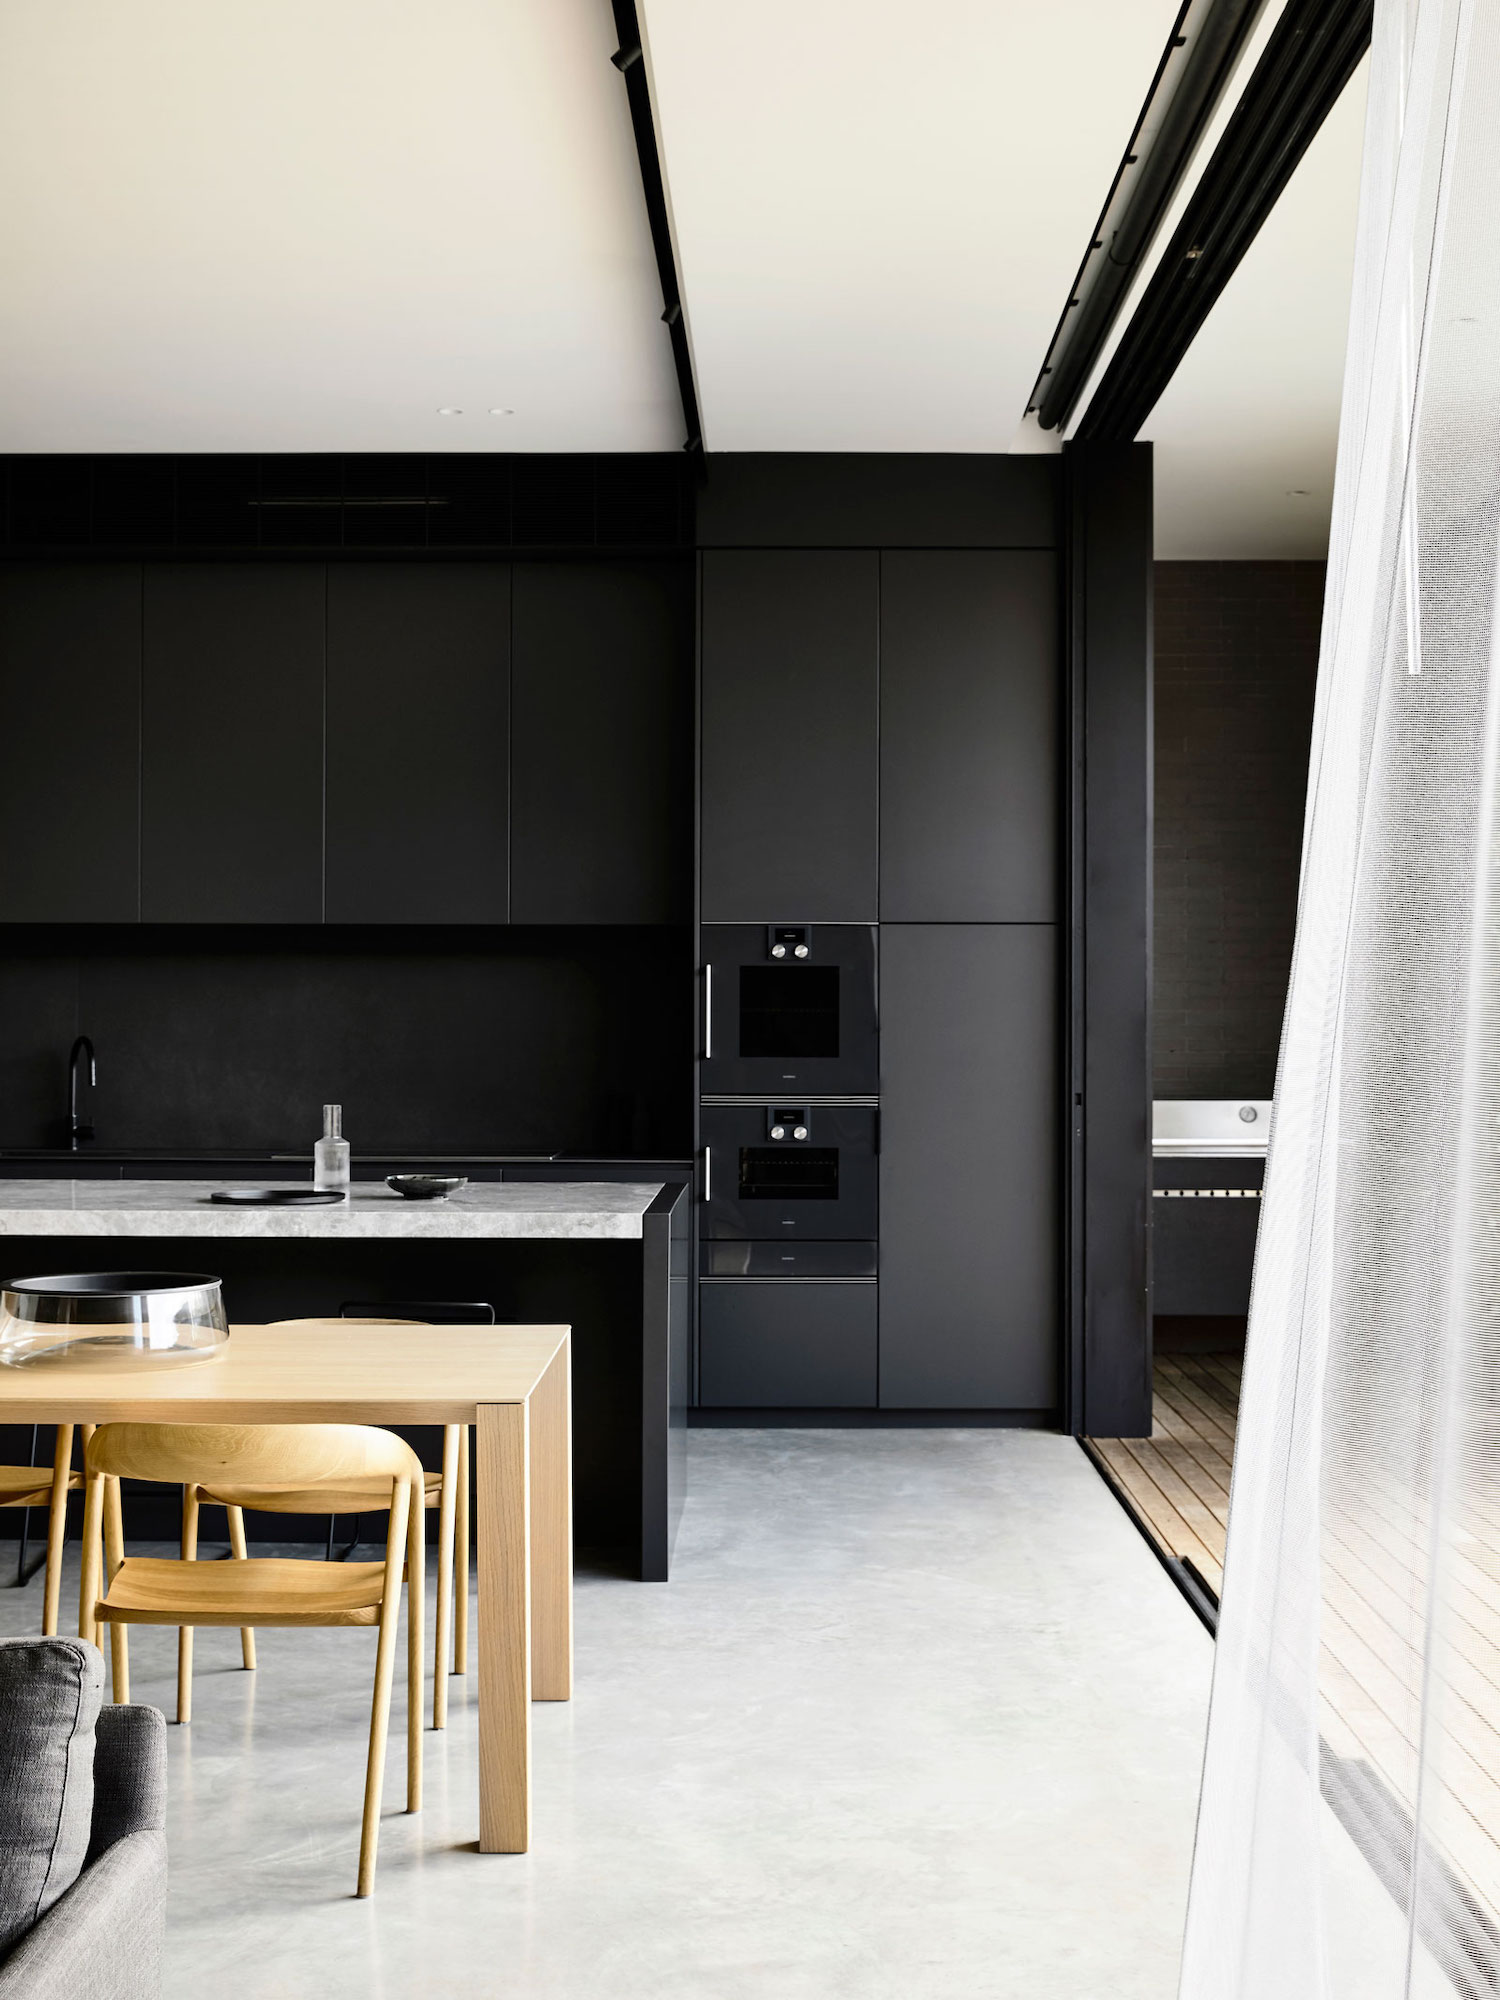 est living wellard architects malvern east 14